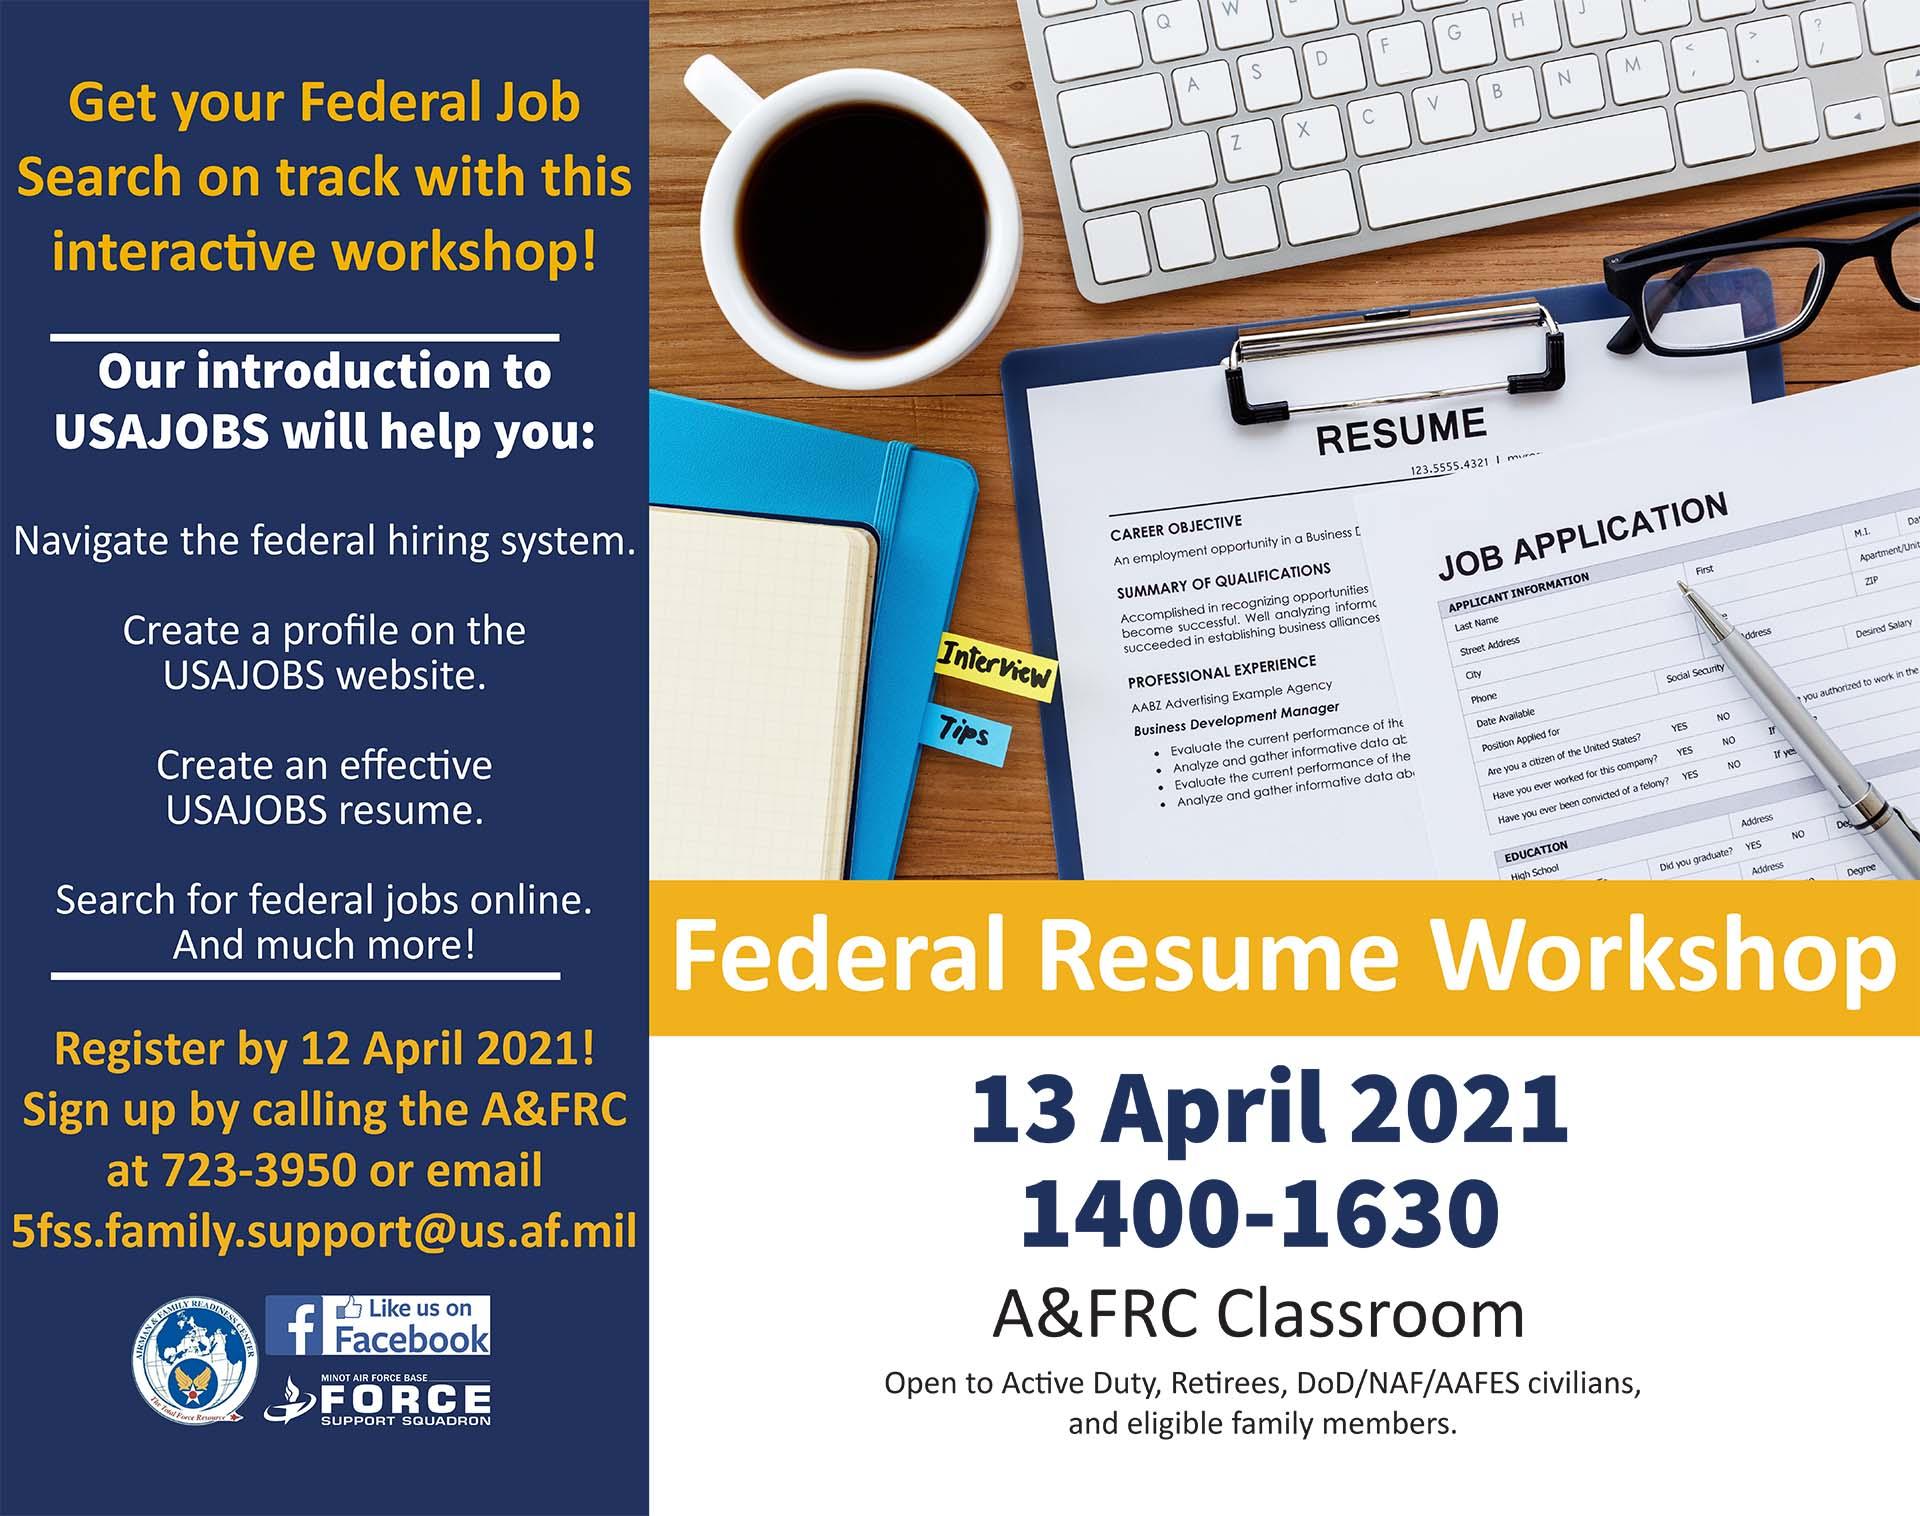 Federal Resume Workshop